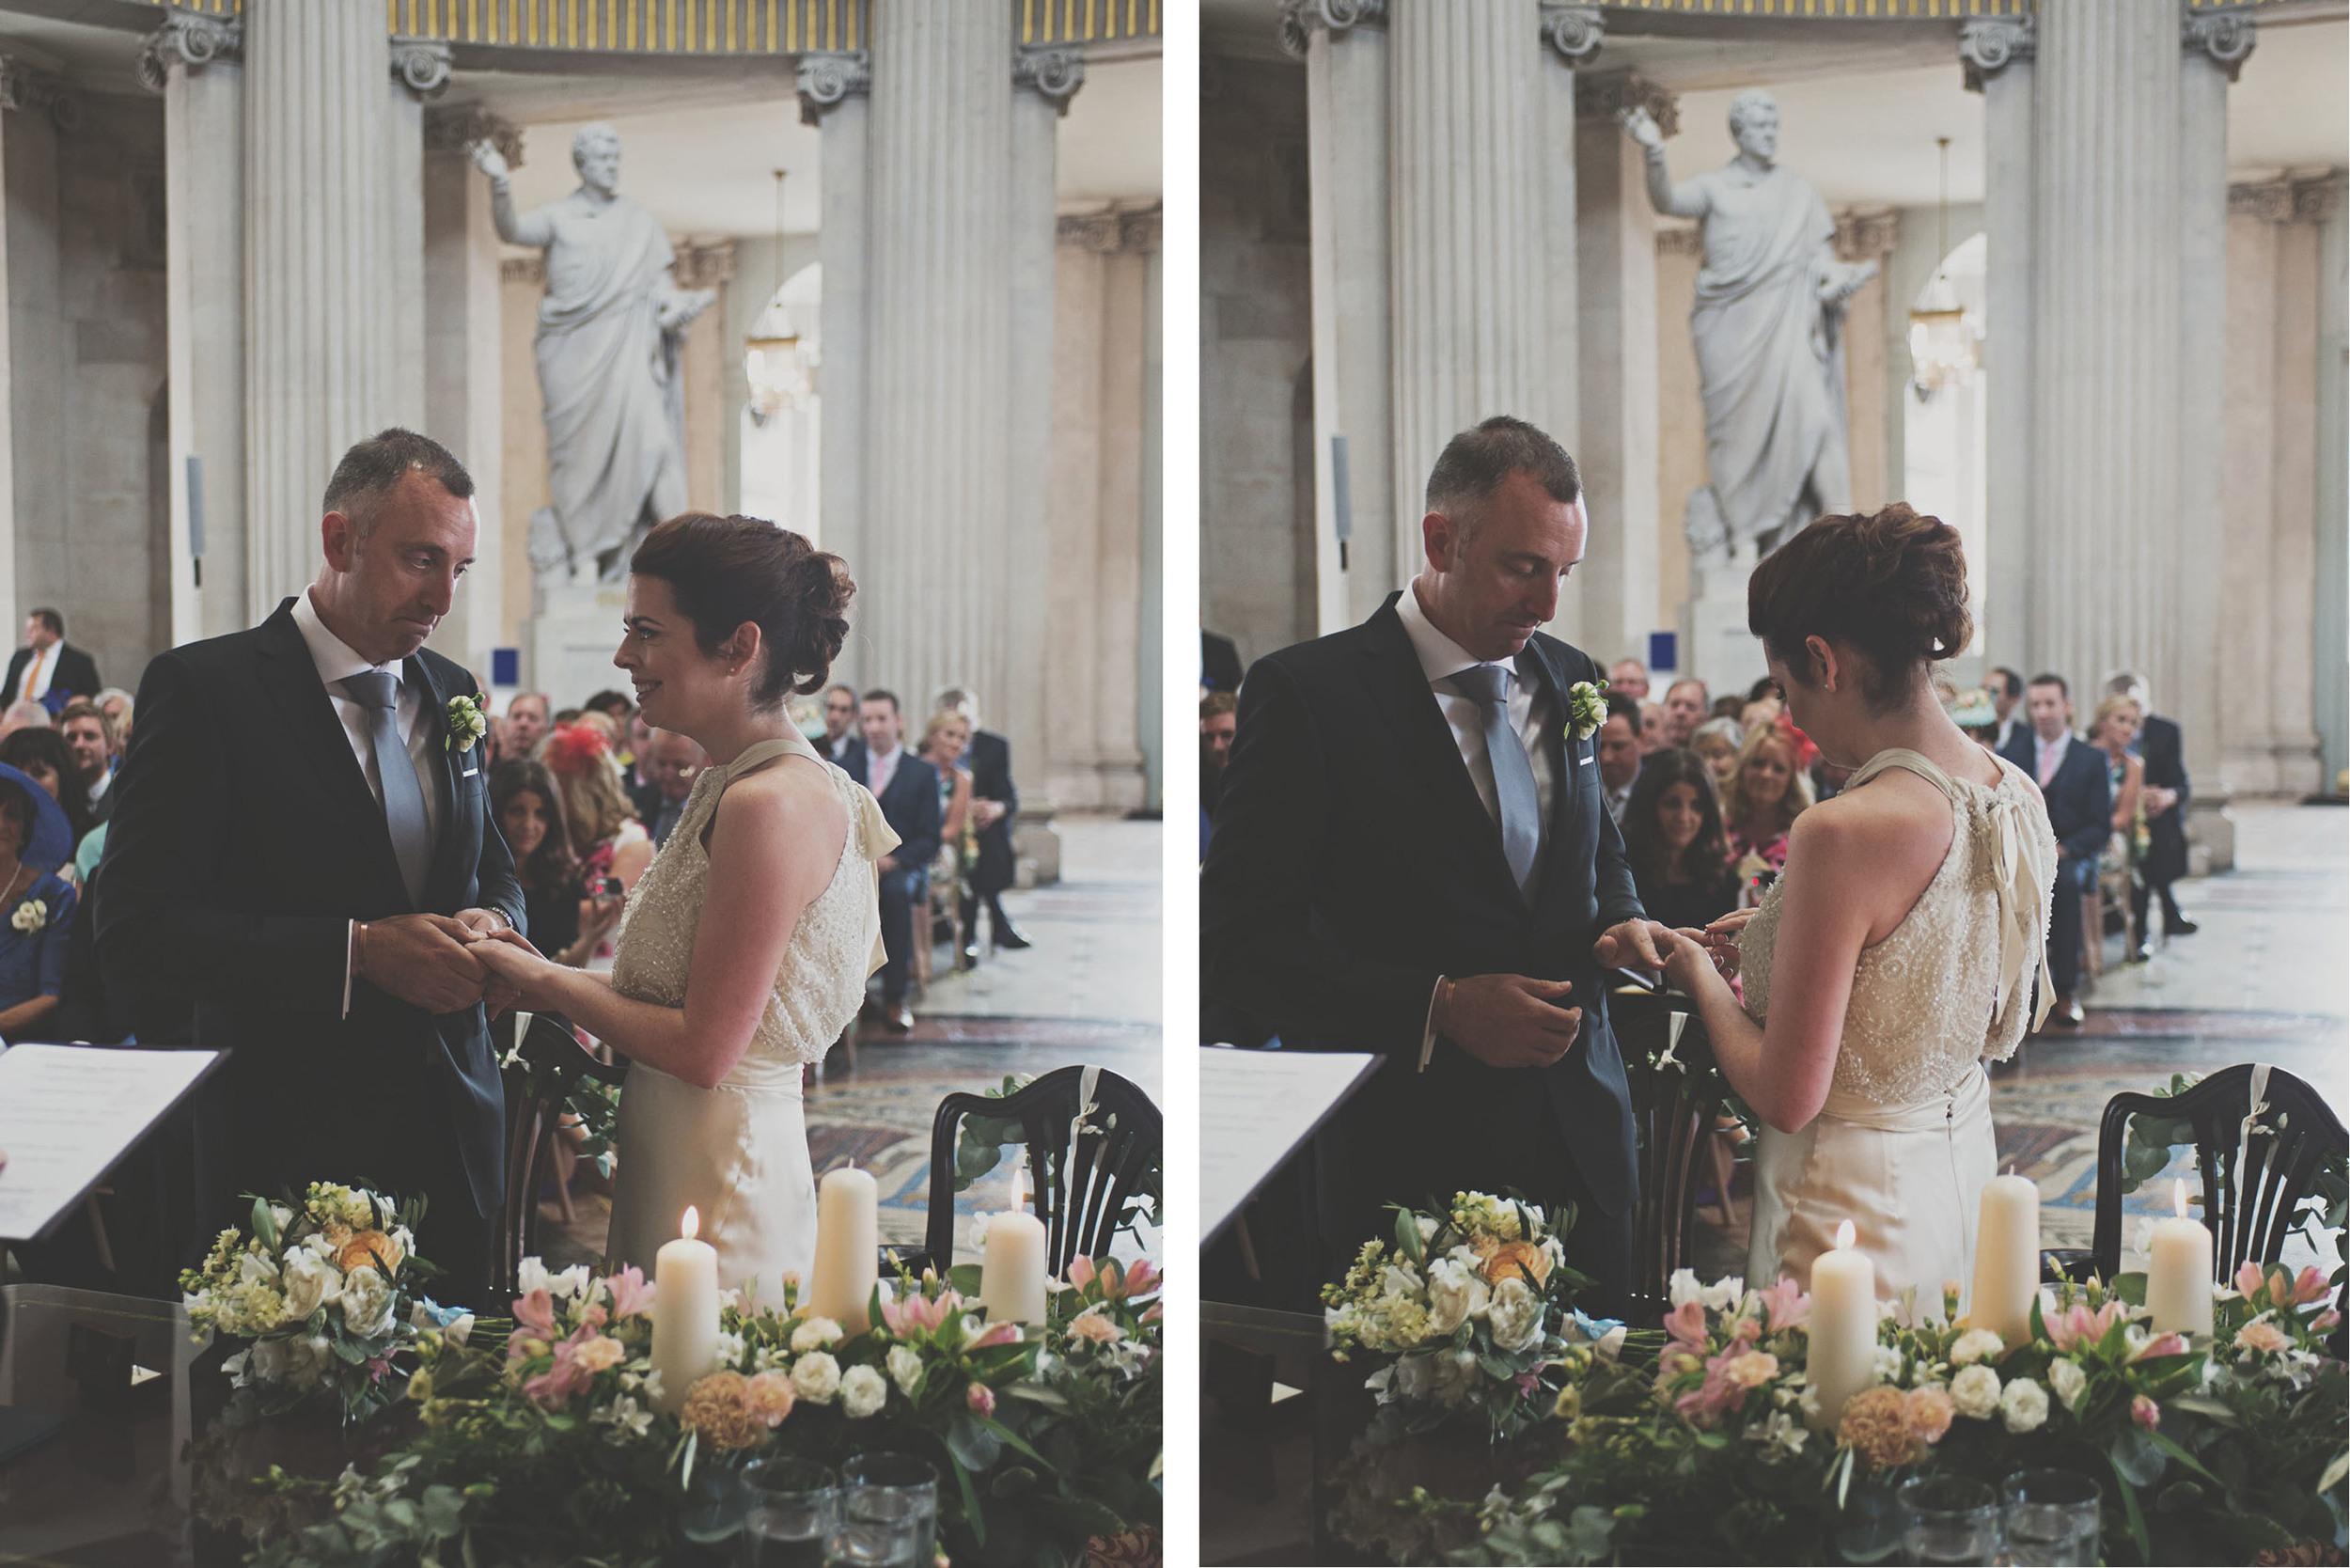 Mary & Donal's Marker Hotel Wedding 042.jpg